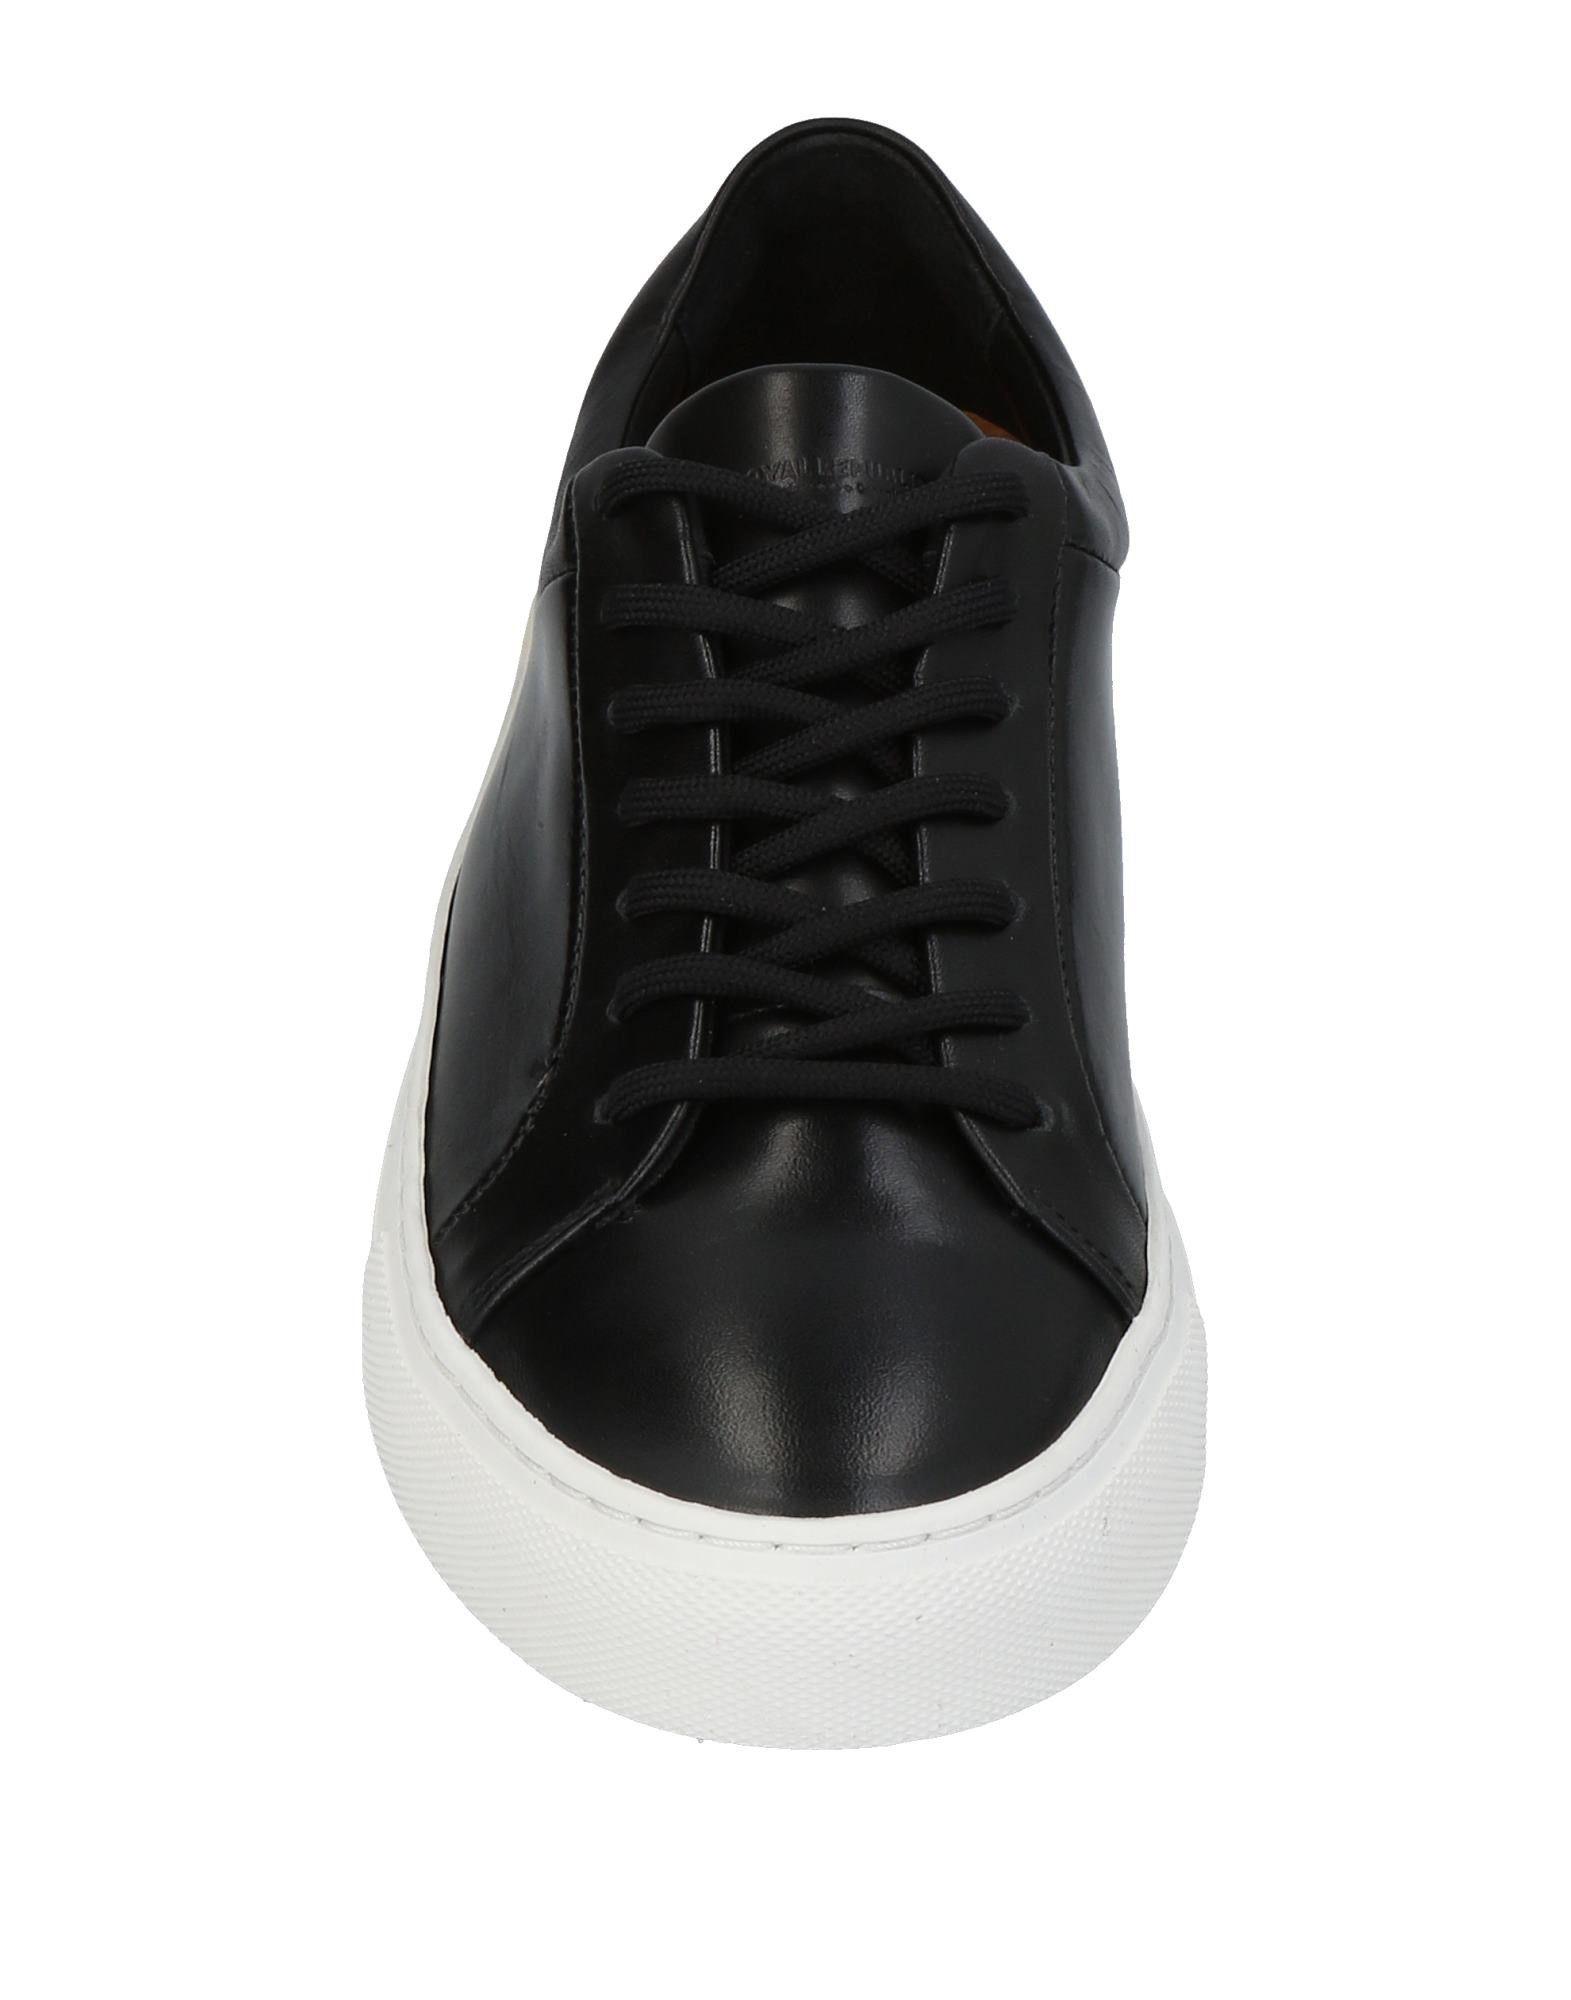 Royal Republiq Sneakers es Damen Gutes Preis-Leistungs-Verhältnis, es Sneakers lohnt sich b0f0d5